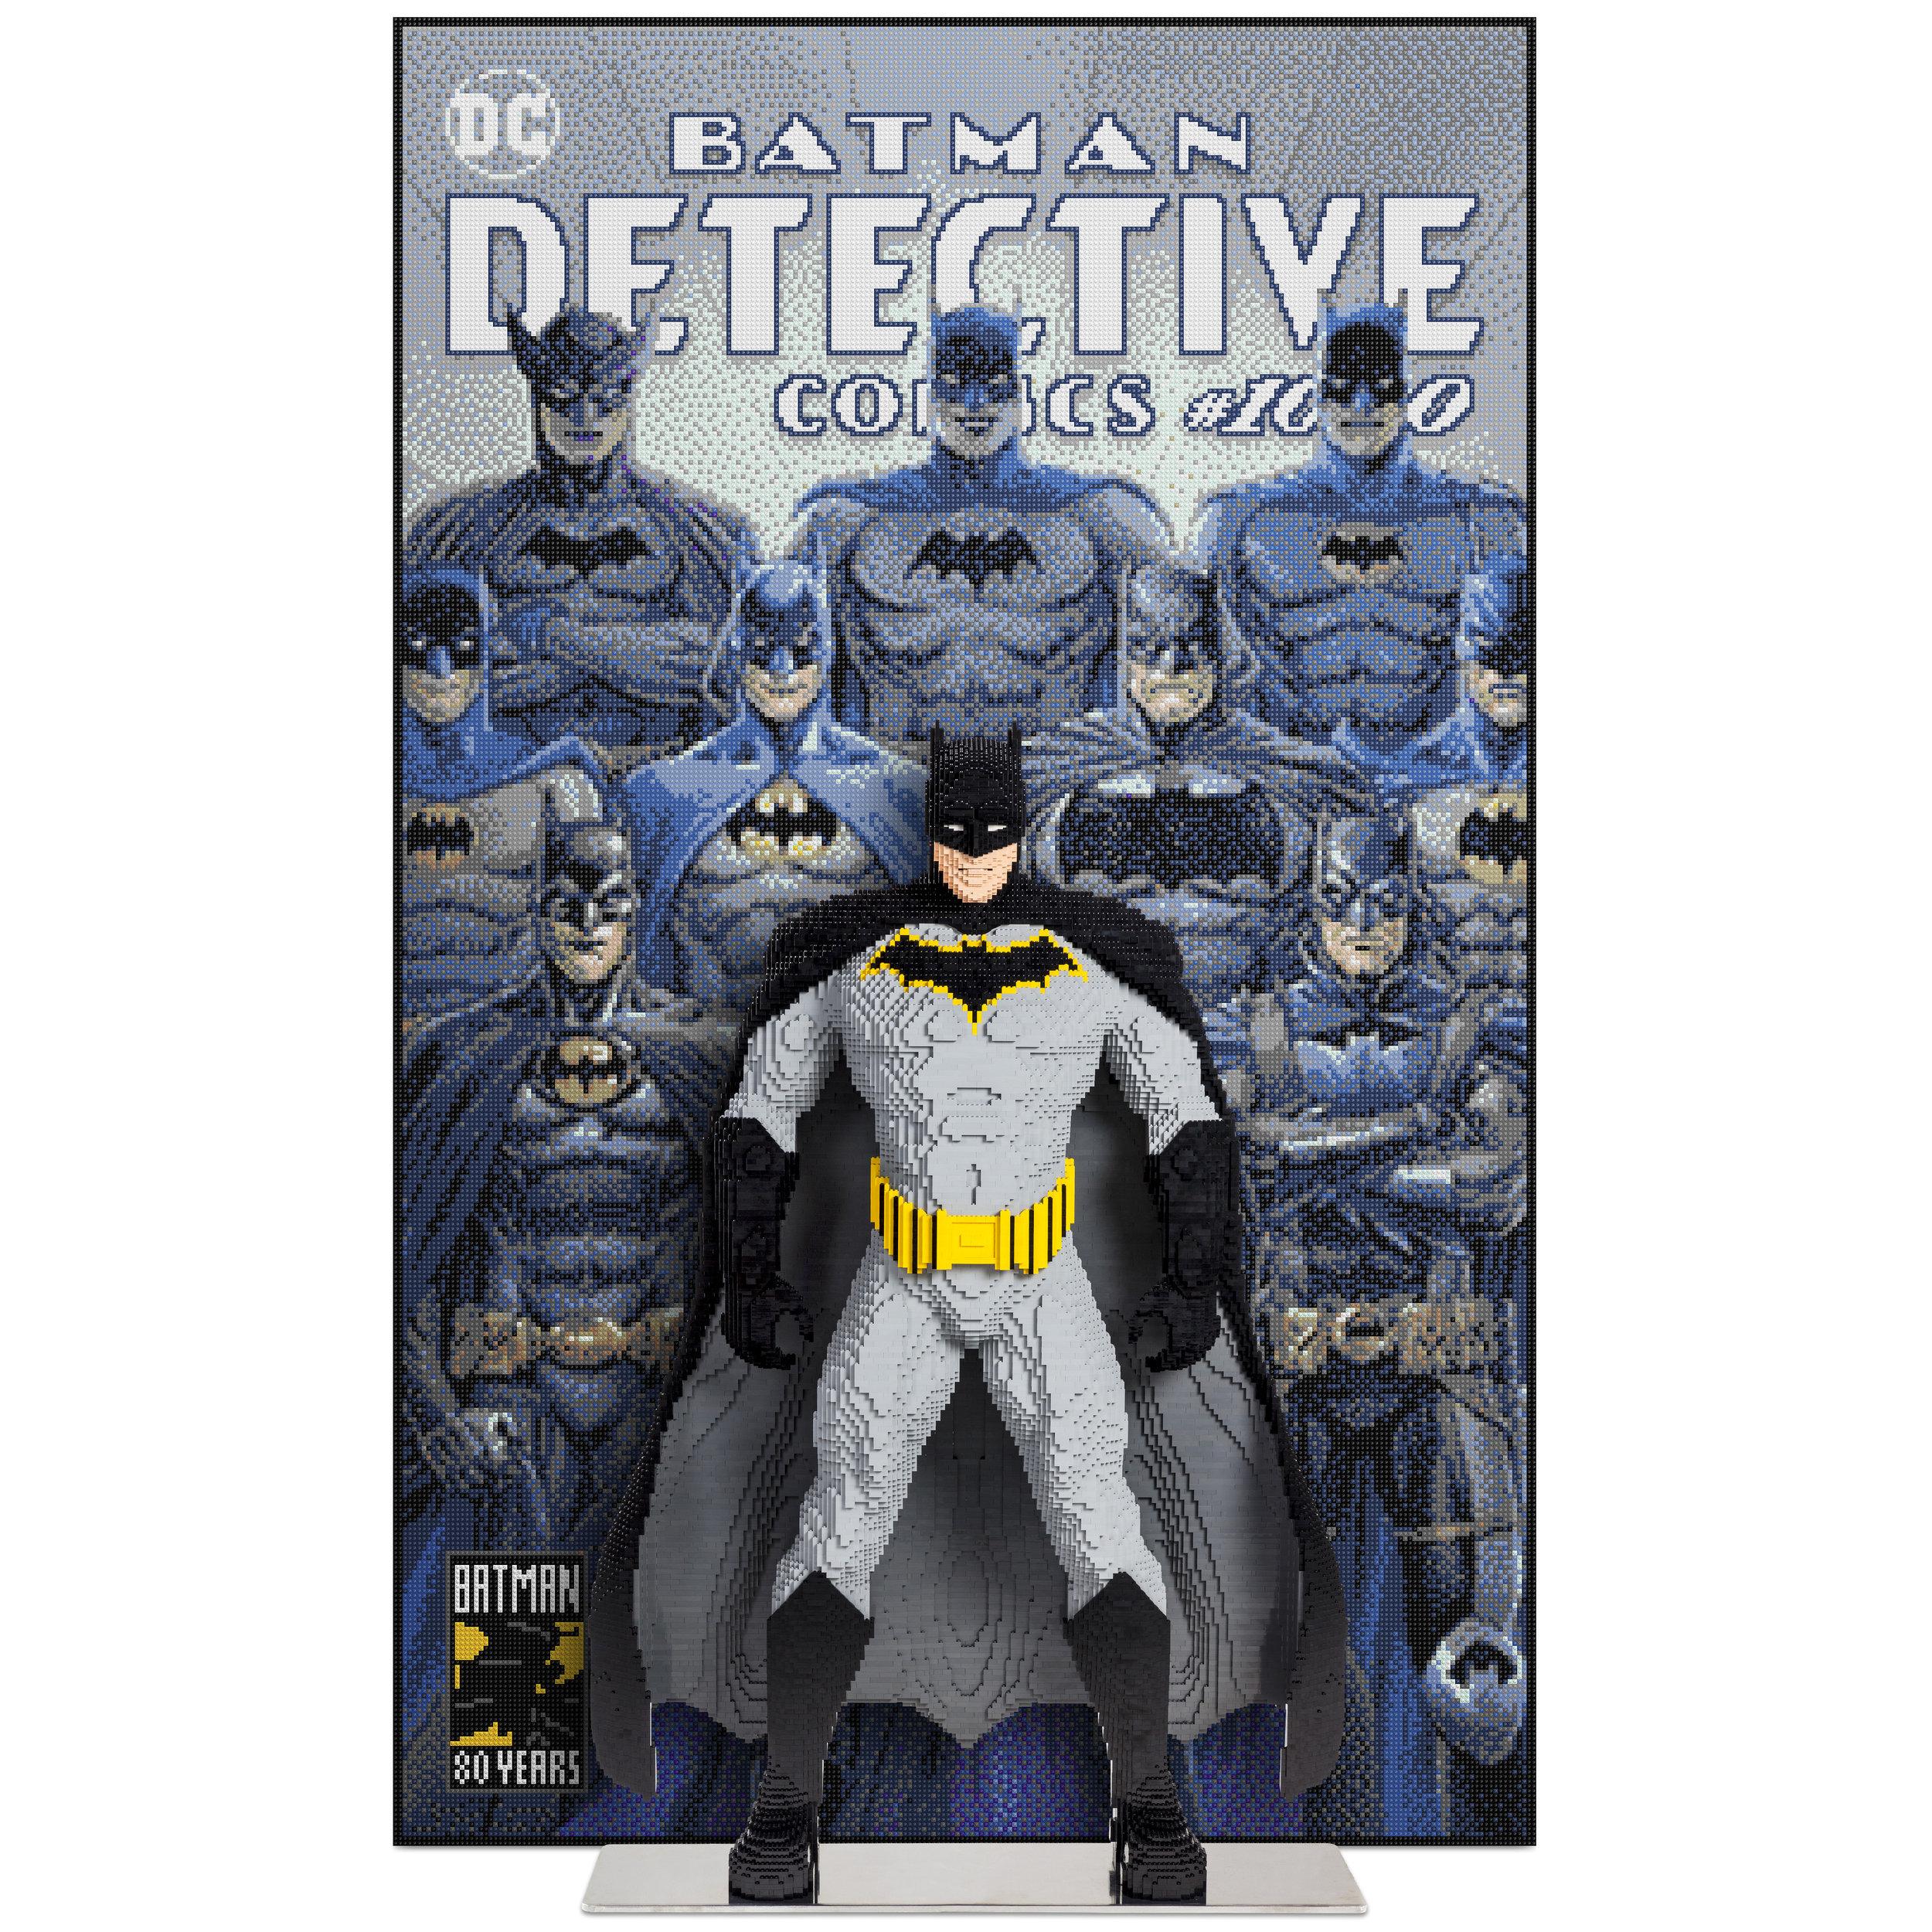 LEGO_Batman_Mural_SDCC20191 (002).jpg